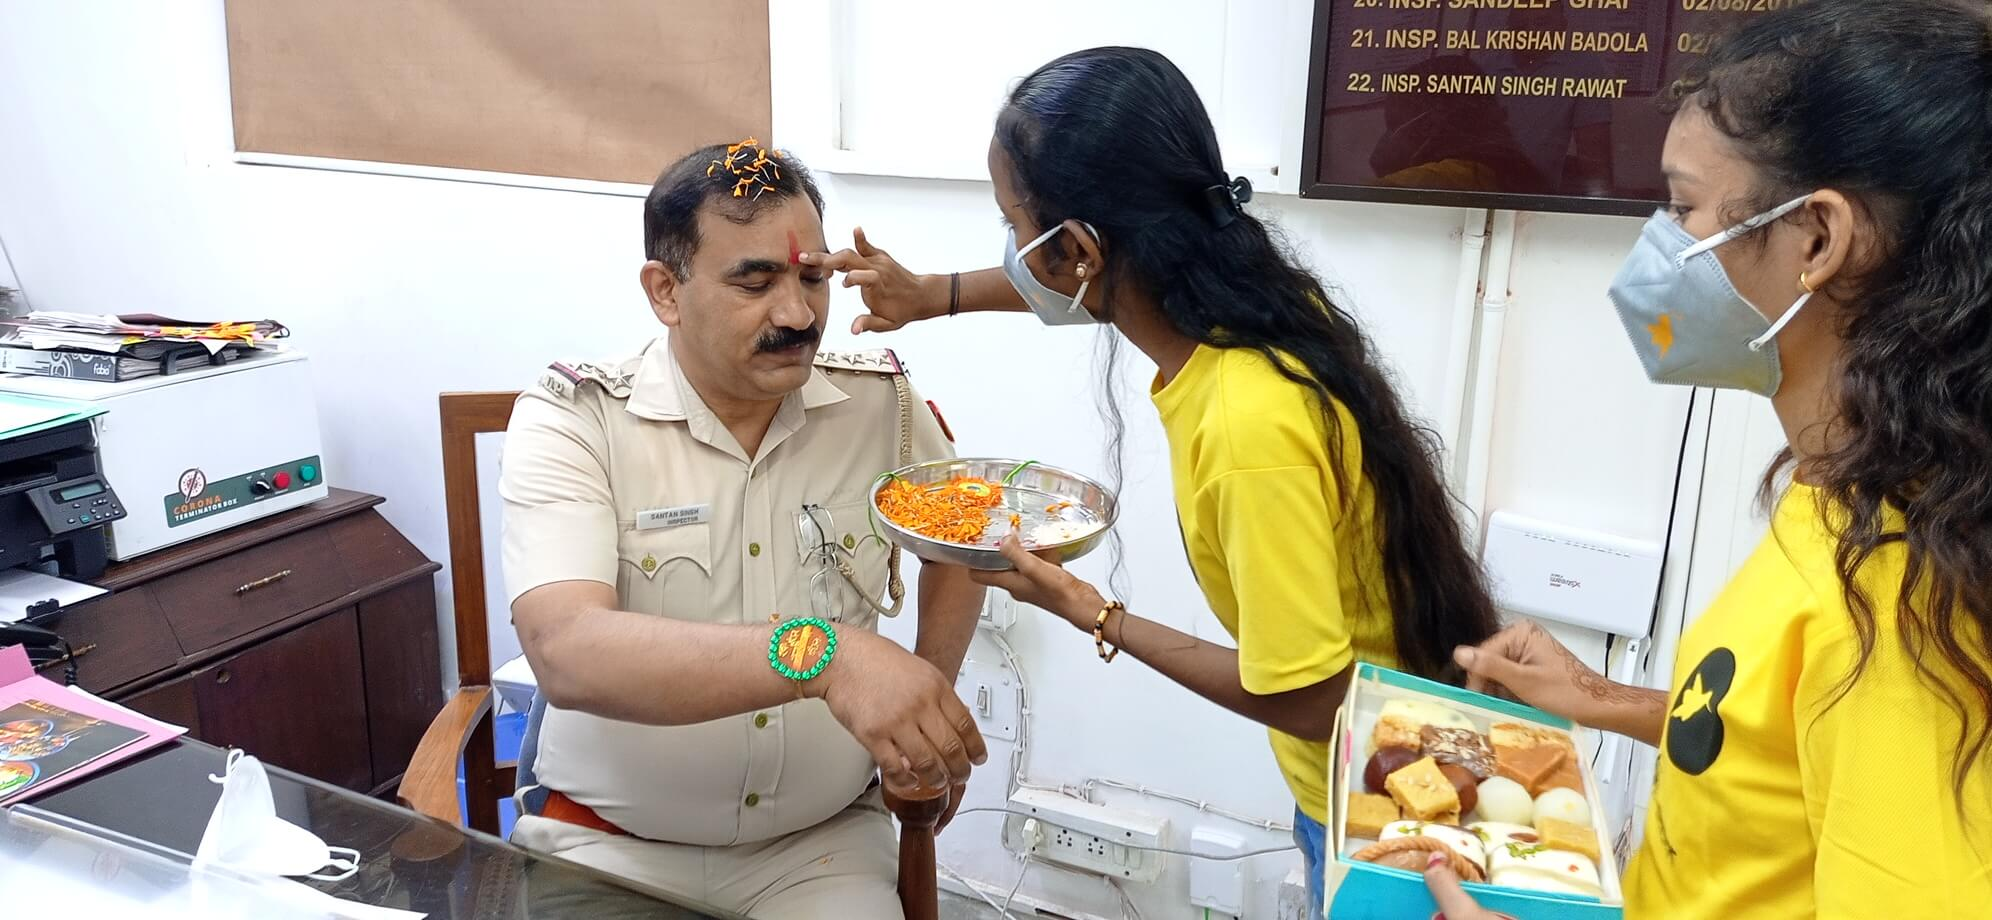 Raksha Bandhan with Delhi Police